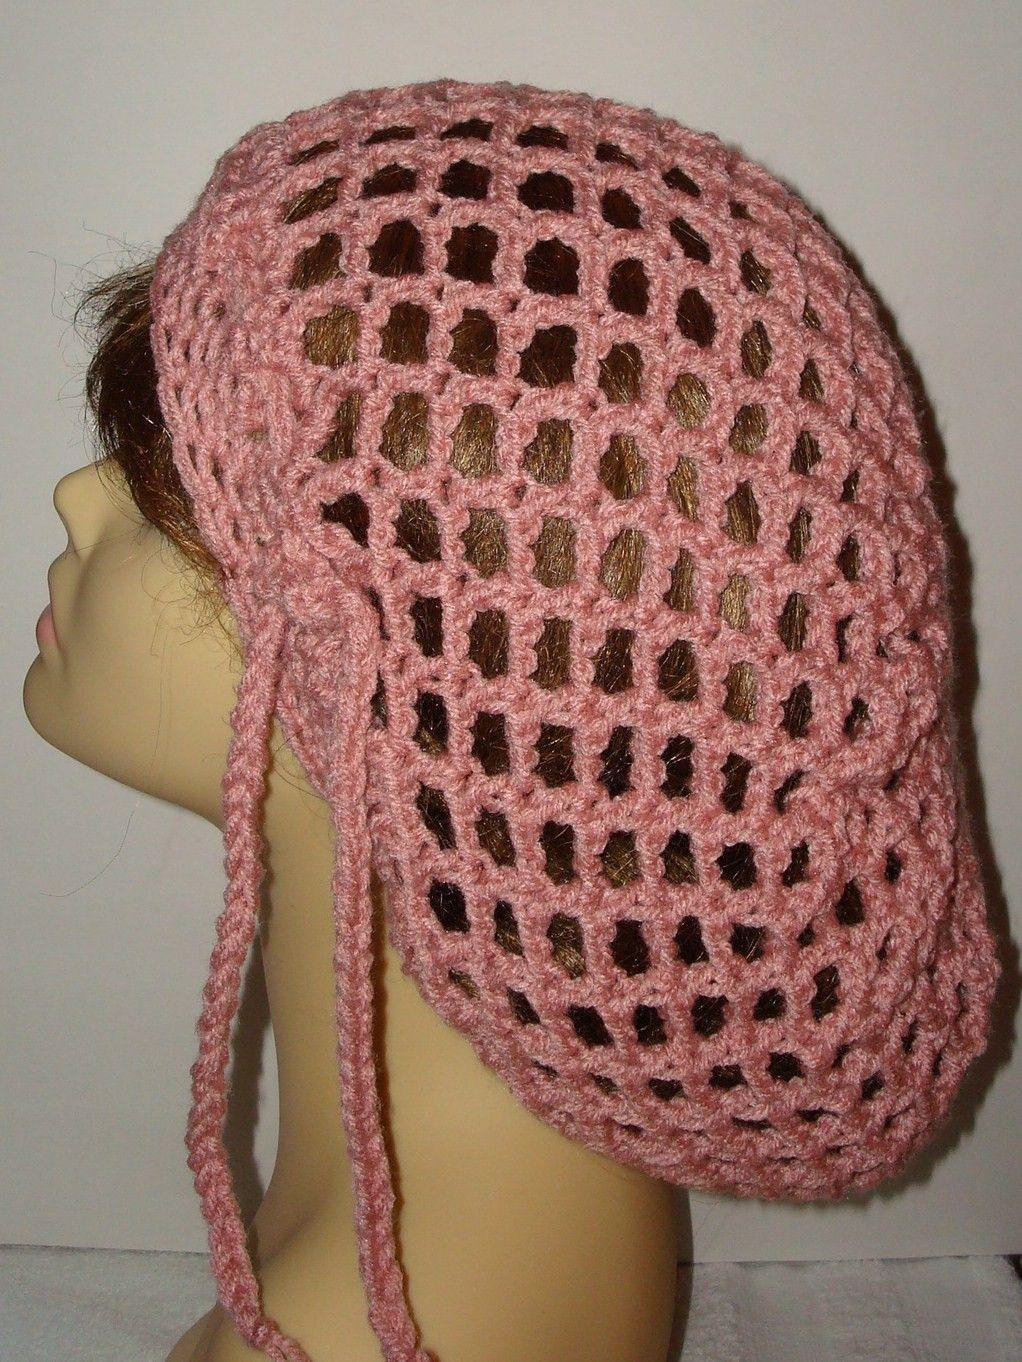 Knitting pattern rasta hat free patterns crochet pinterest image detail for pattern crochet slouchy open weave rasta tam hat pattern pdf only bankloansurffo Image collections